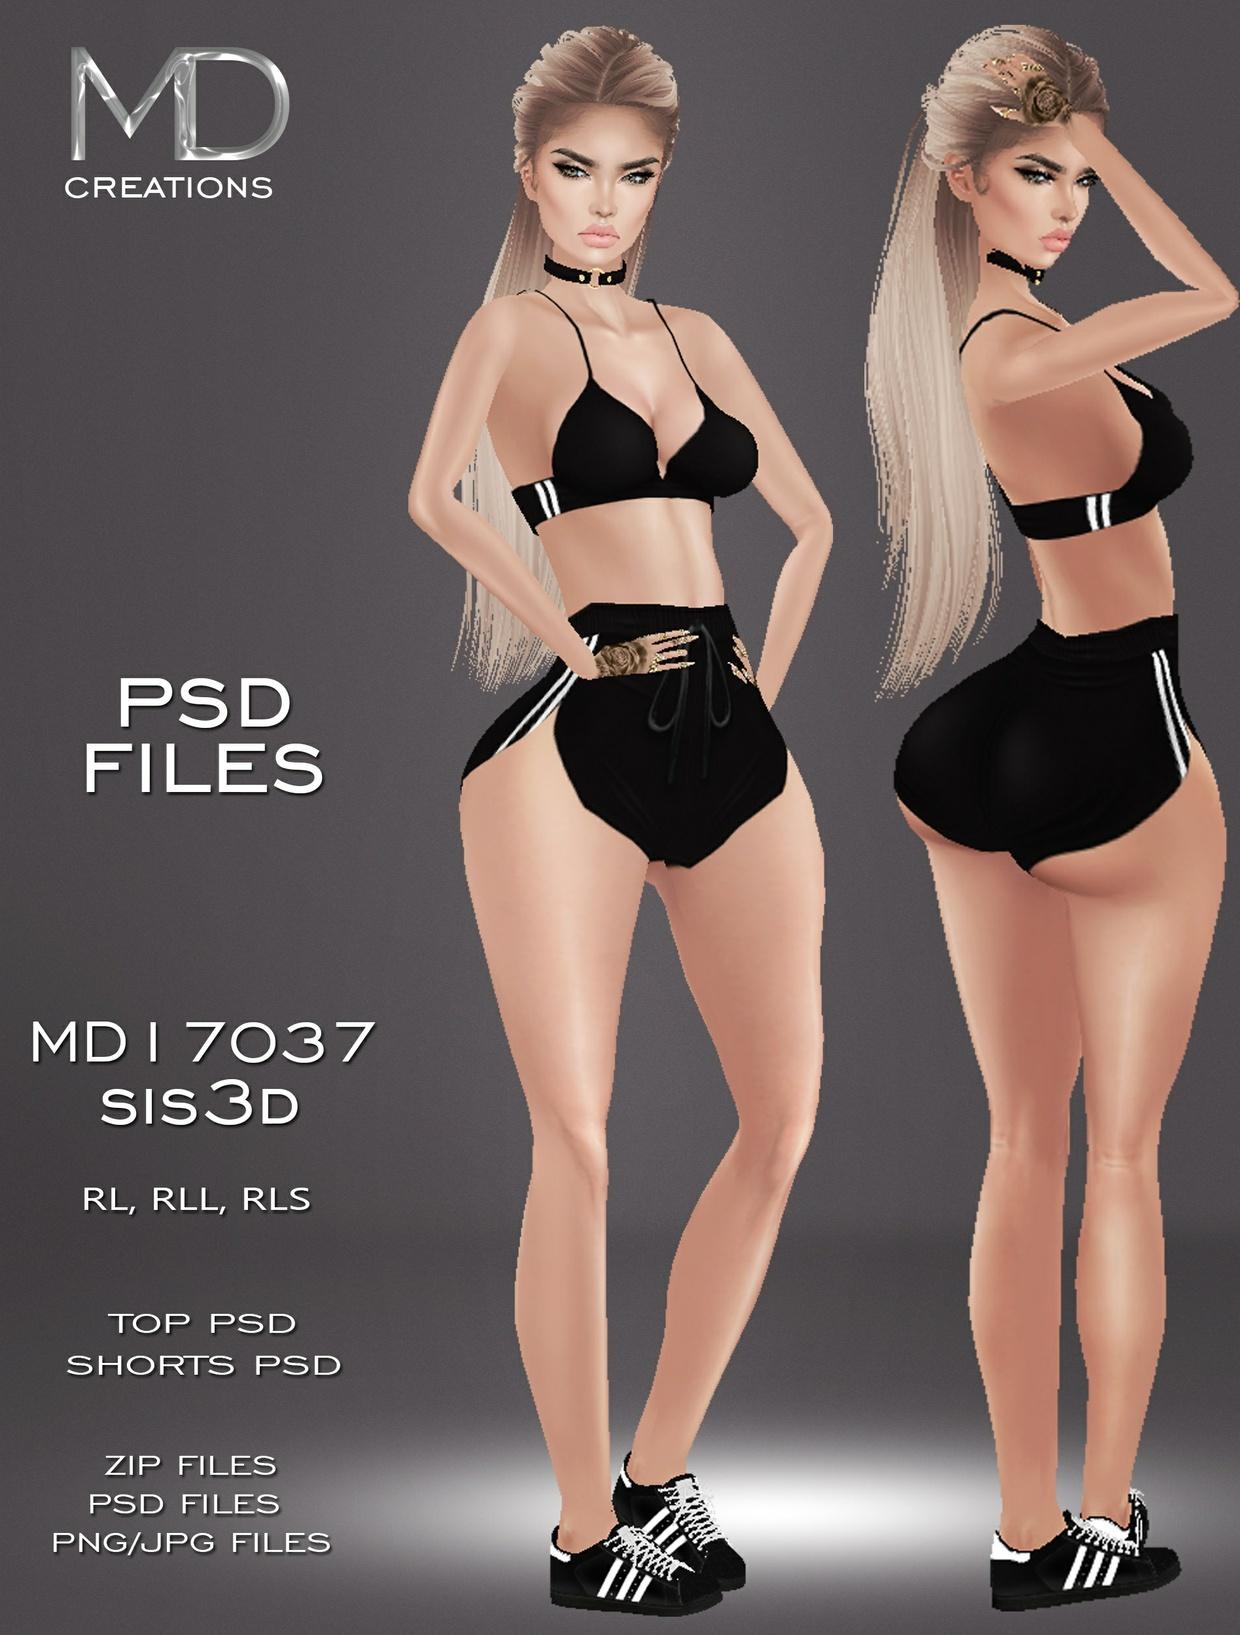 MD17037 - Sis3D - PSD Files